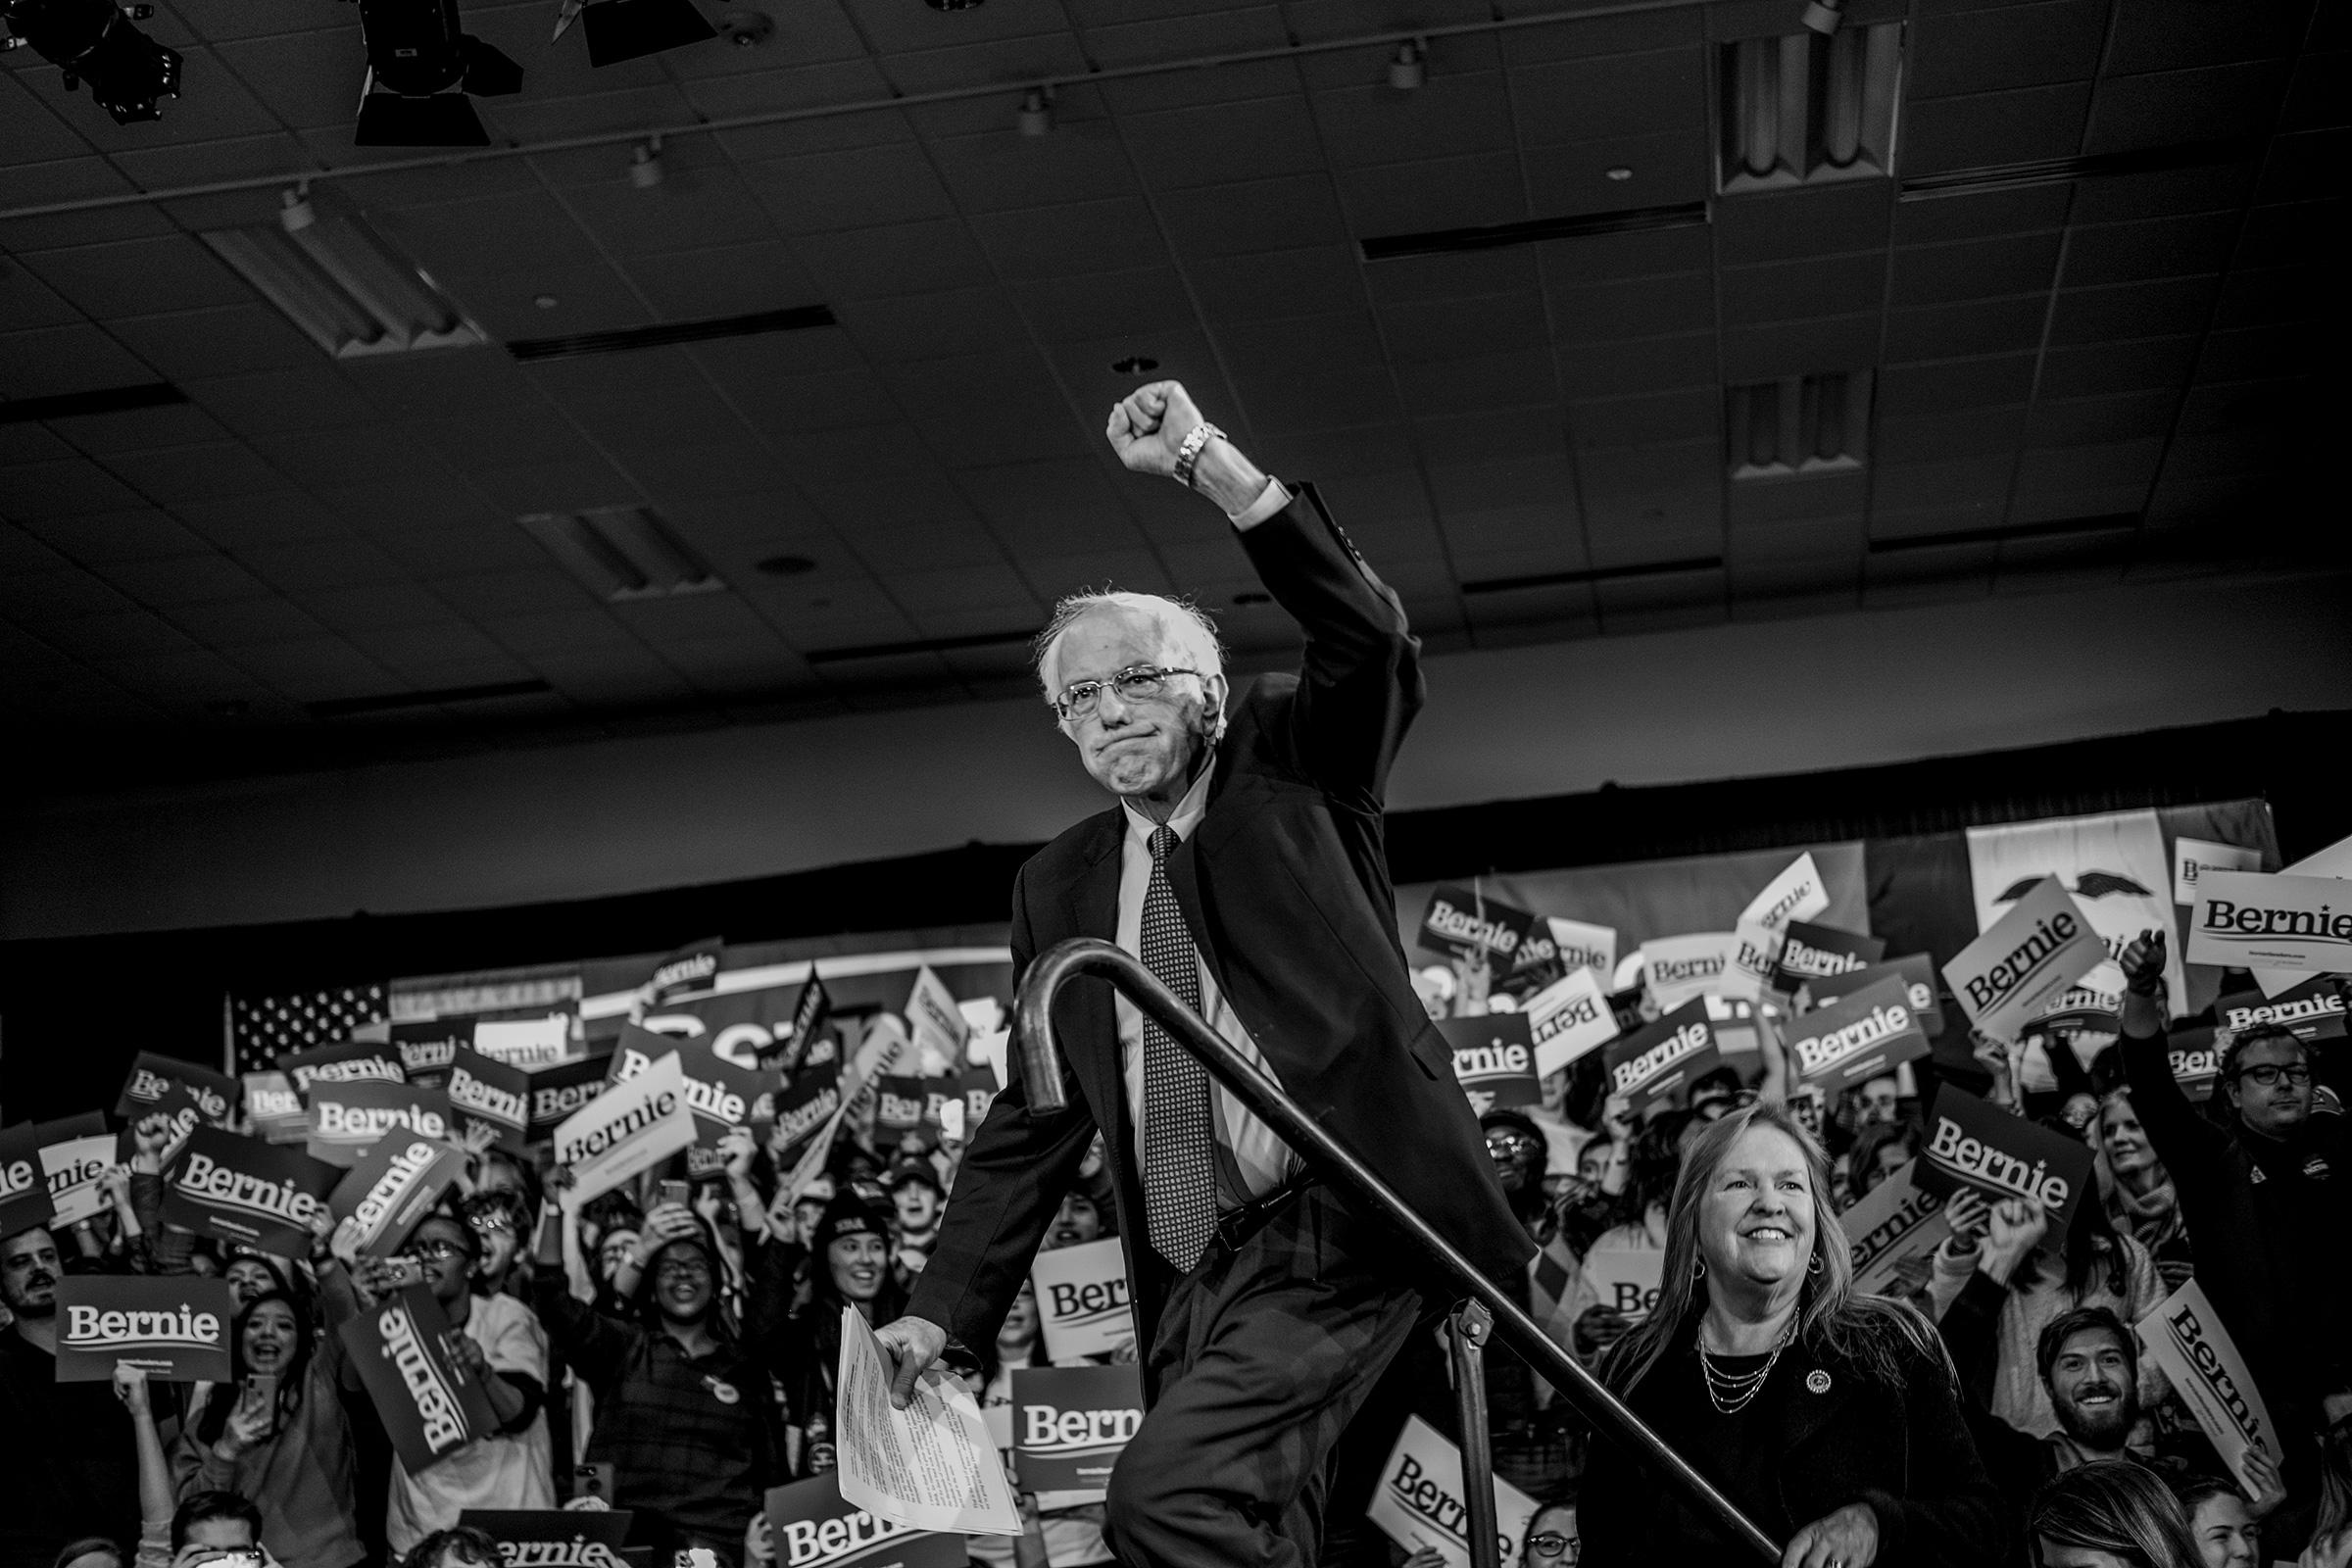 Sen. Bernie Sanders on night of the Iowa Caucus in Des Moines, Iowa on Feb. 3, 2020.